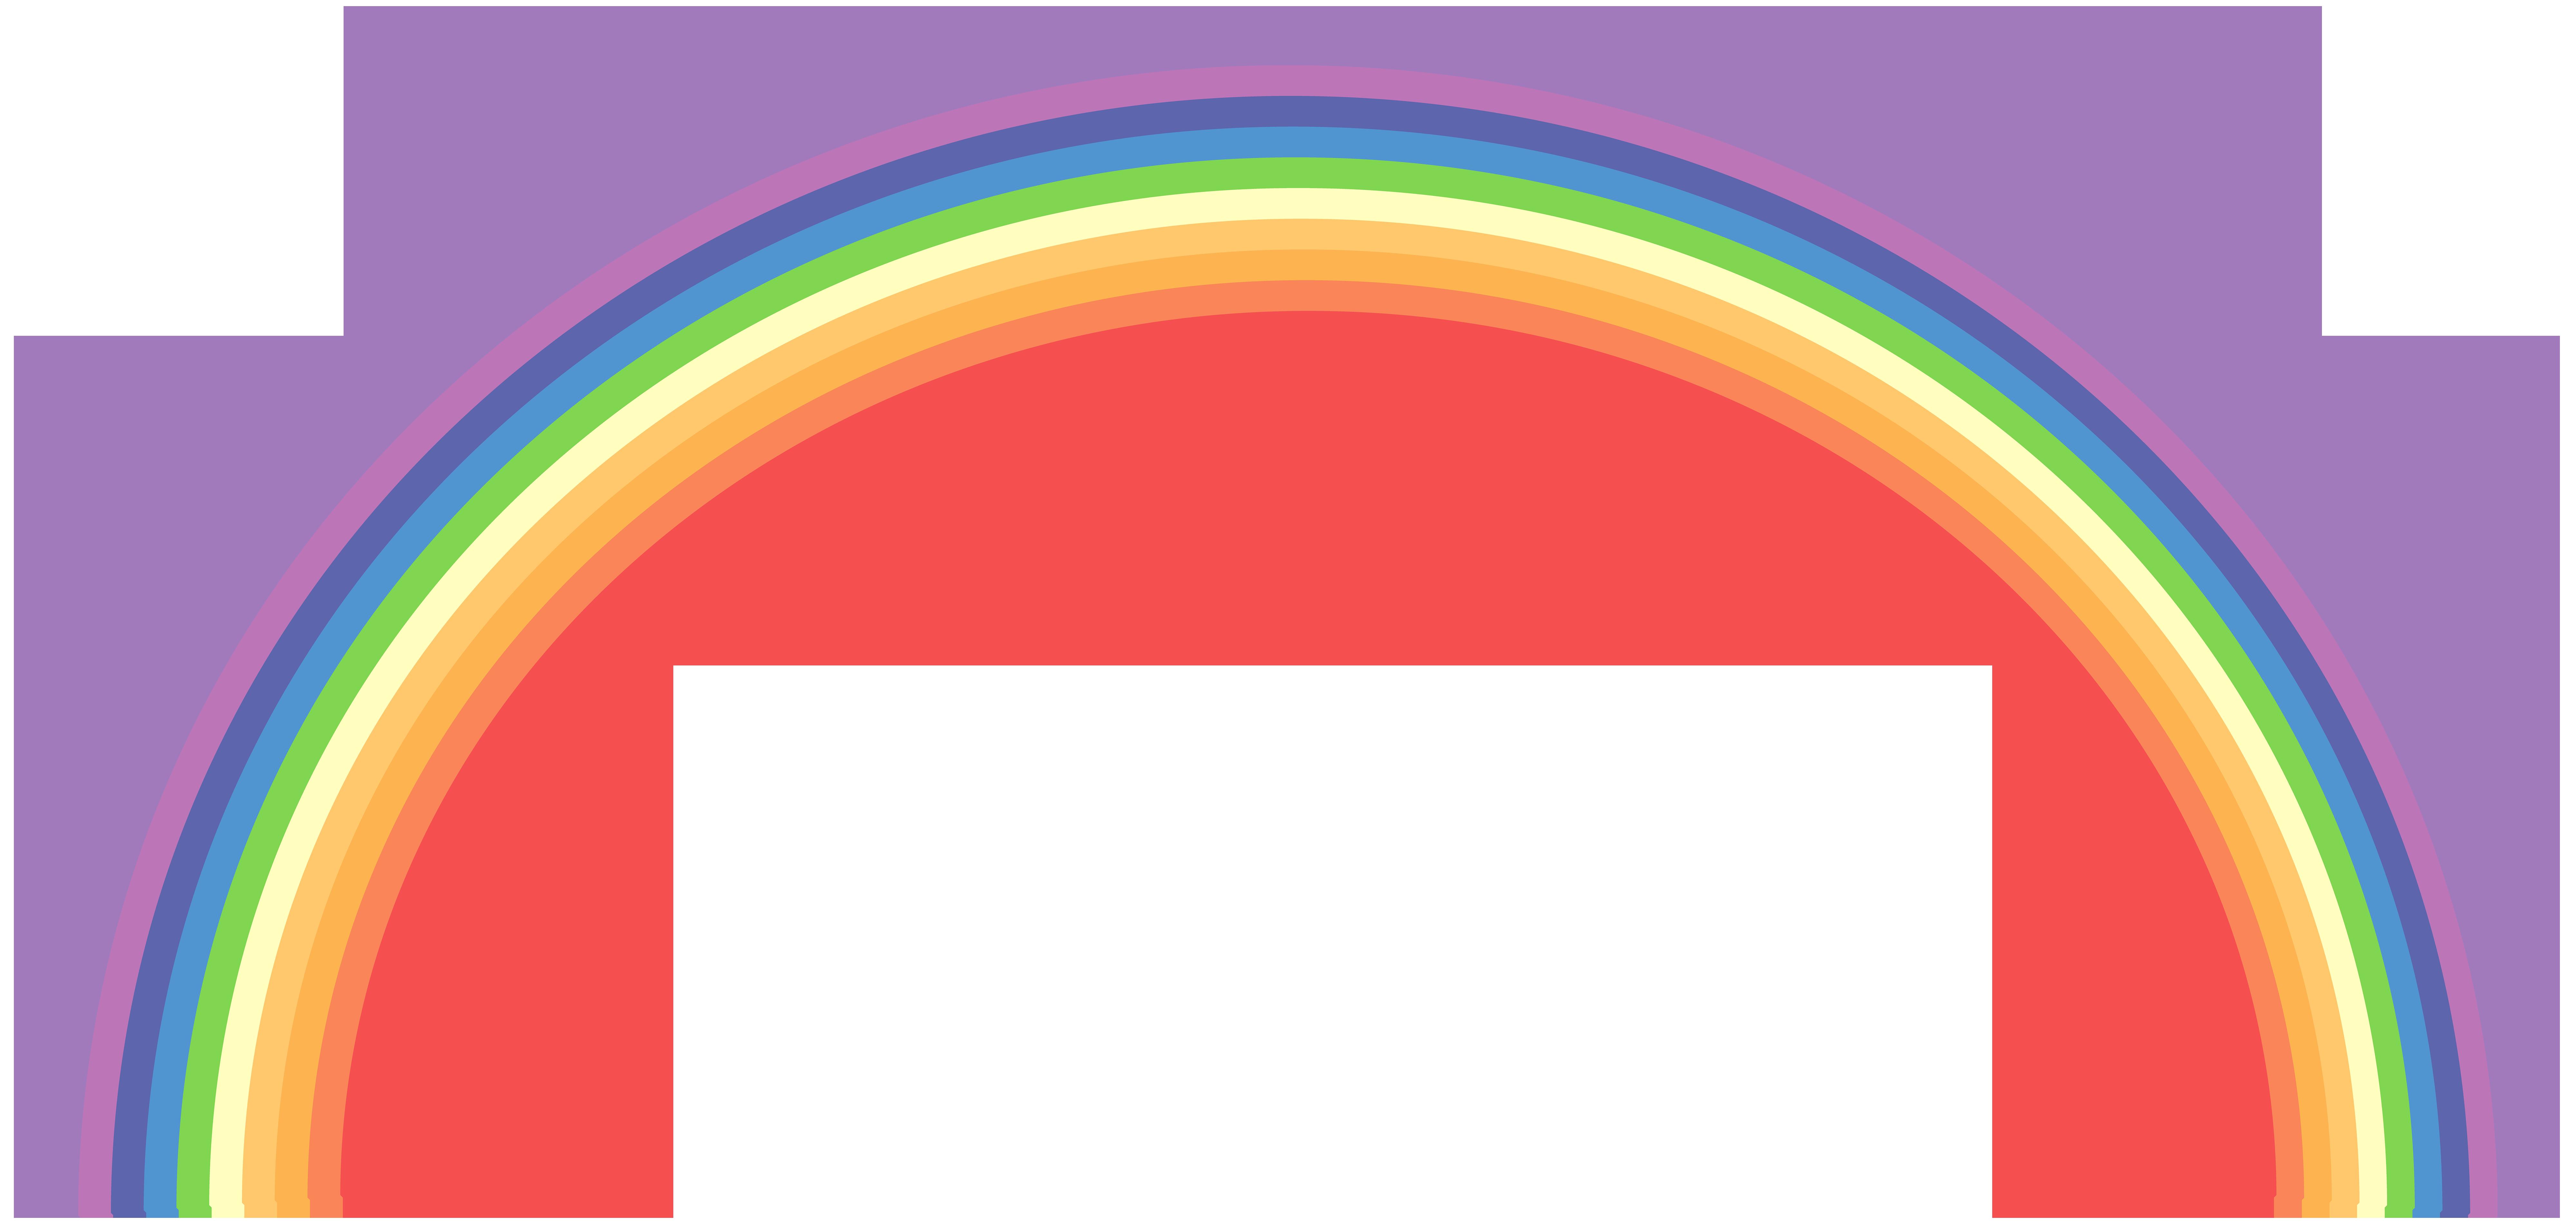 Clipart rainbow transparent background. Png clip art image